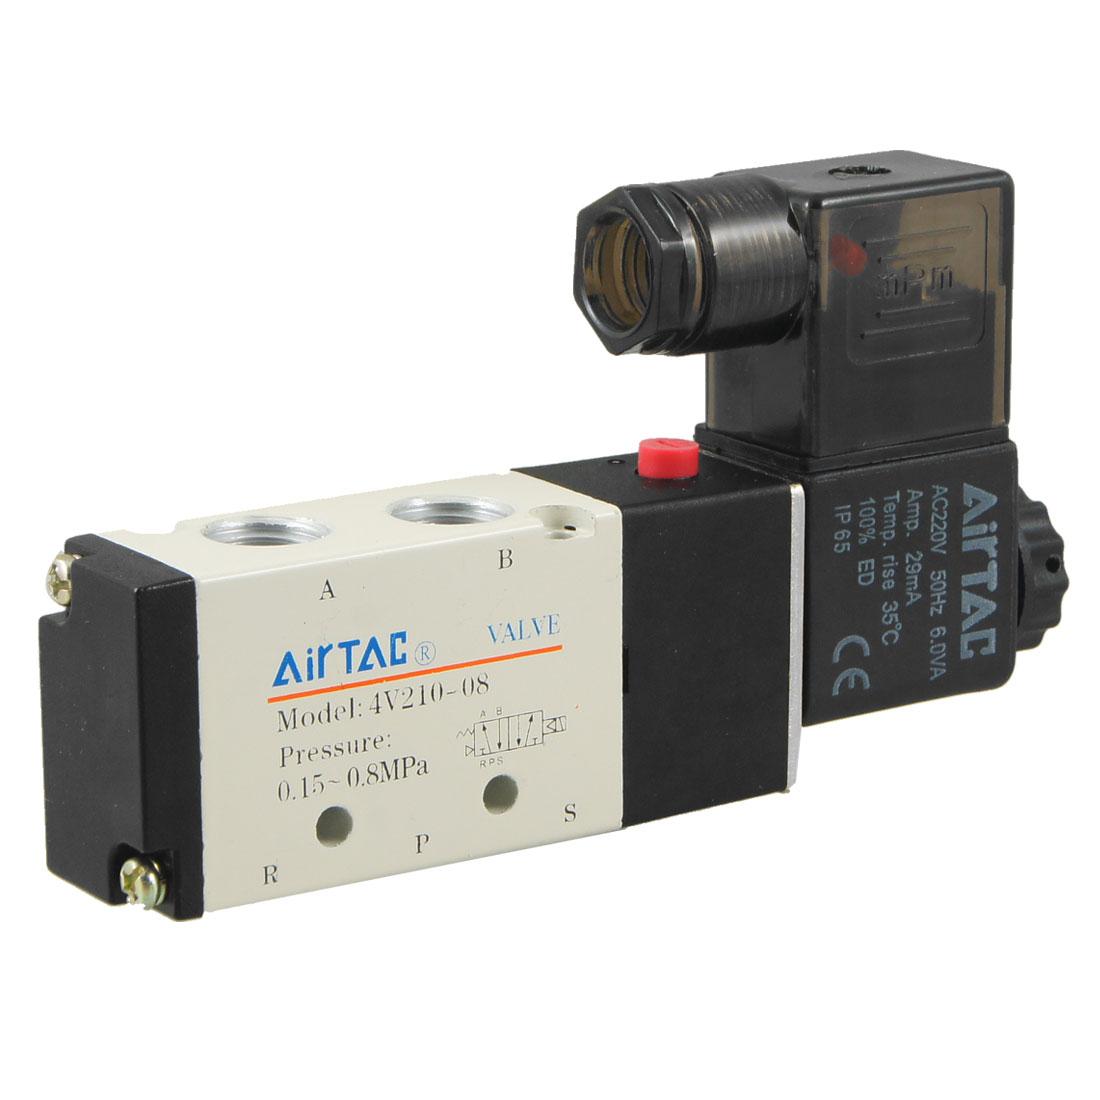 AC220V 29mA 2 Position 5 Port Pneumatic Air Control Solenoid Valve 4V210-08